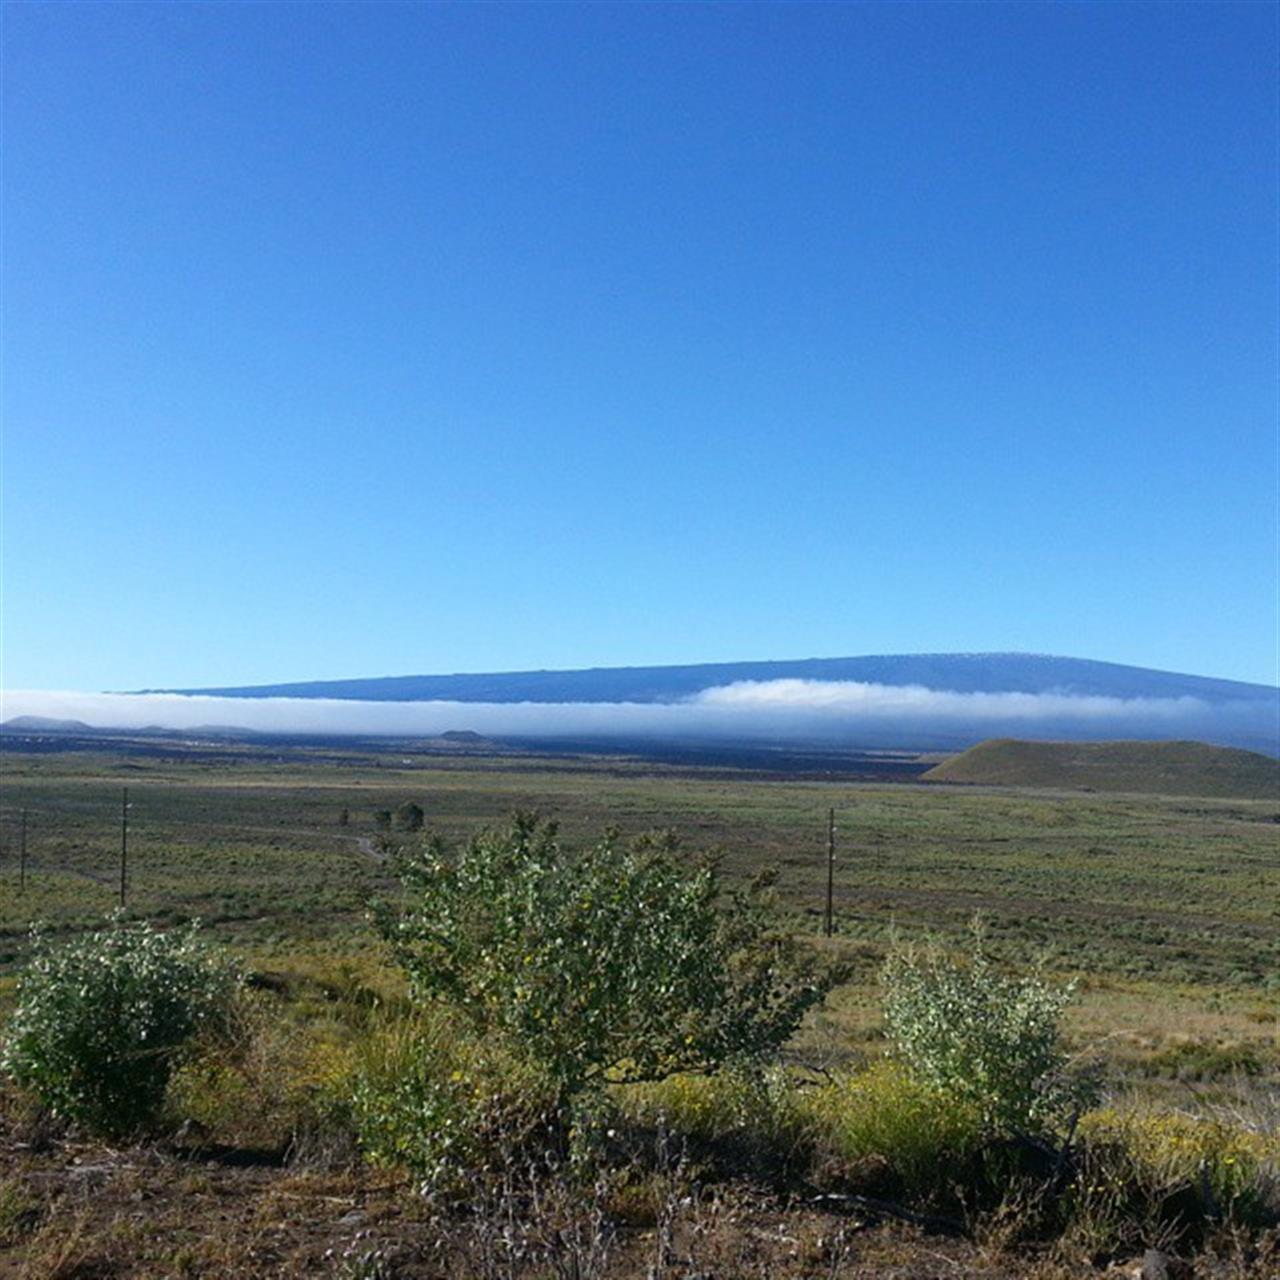 Saddle Road commute for work today  #BigIsland #Hawaii #leadingRElocal